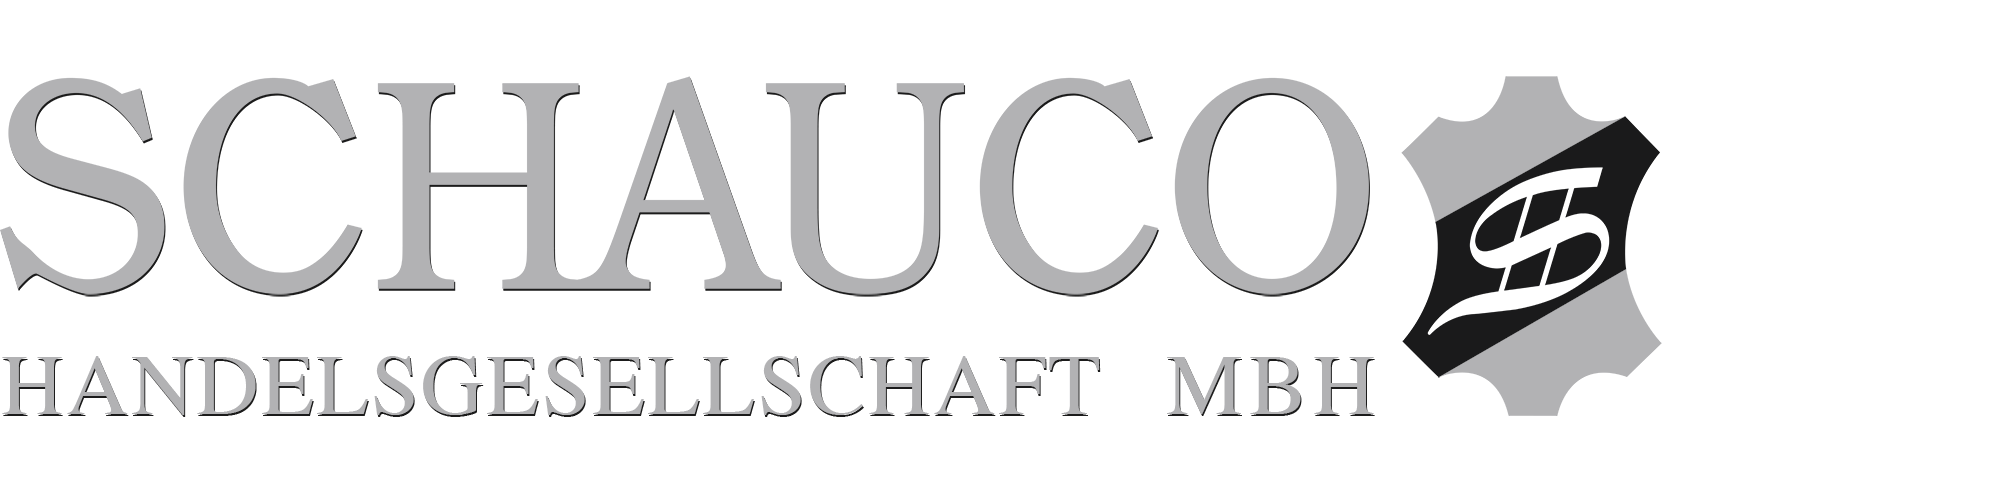 Schauco Handelsgesellschaft mbH